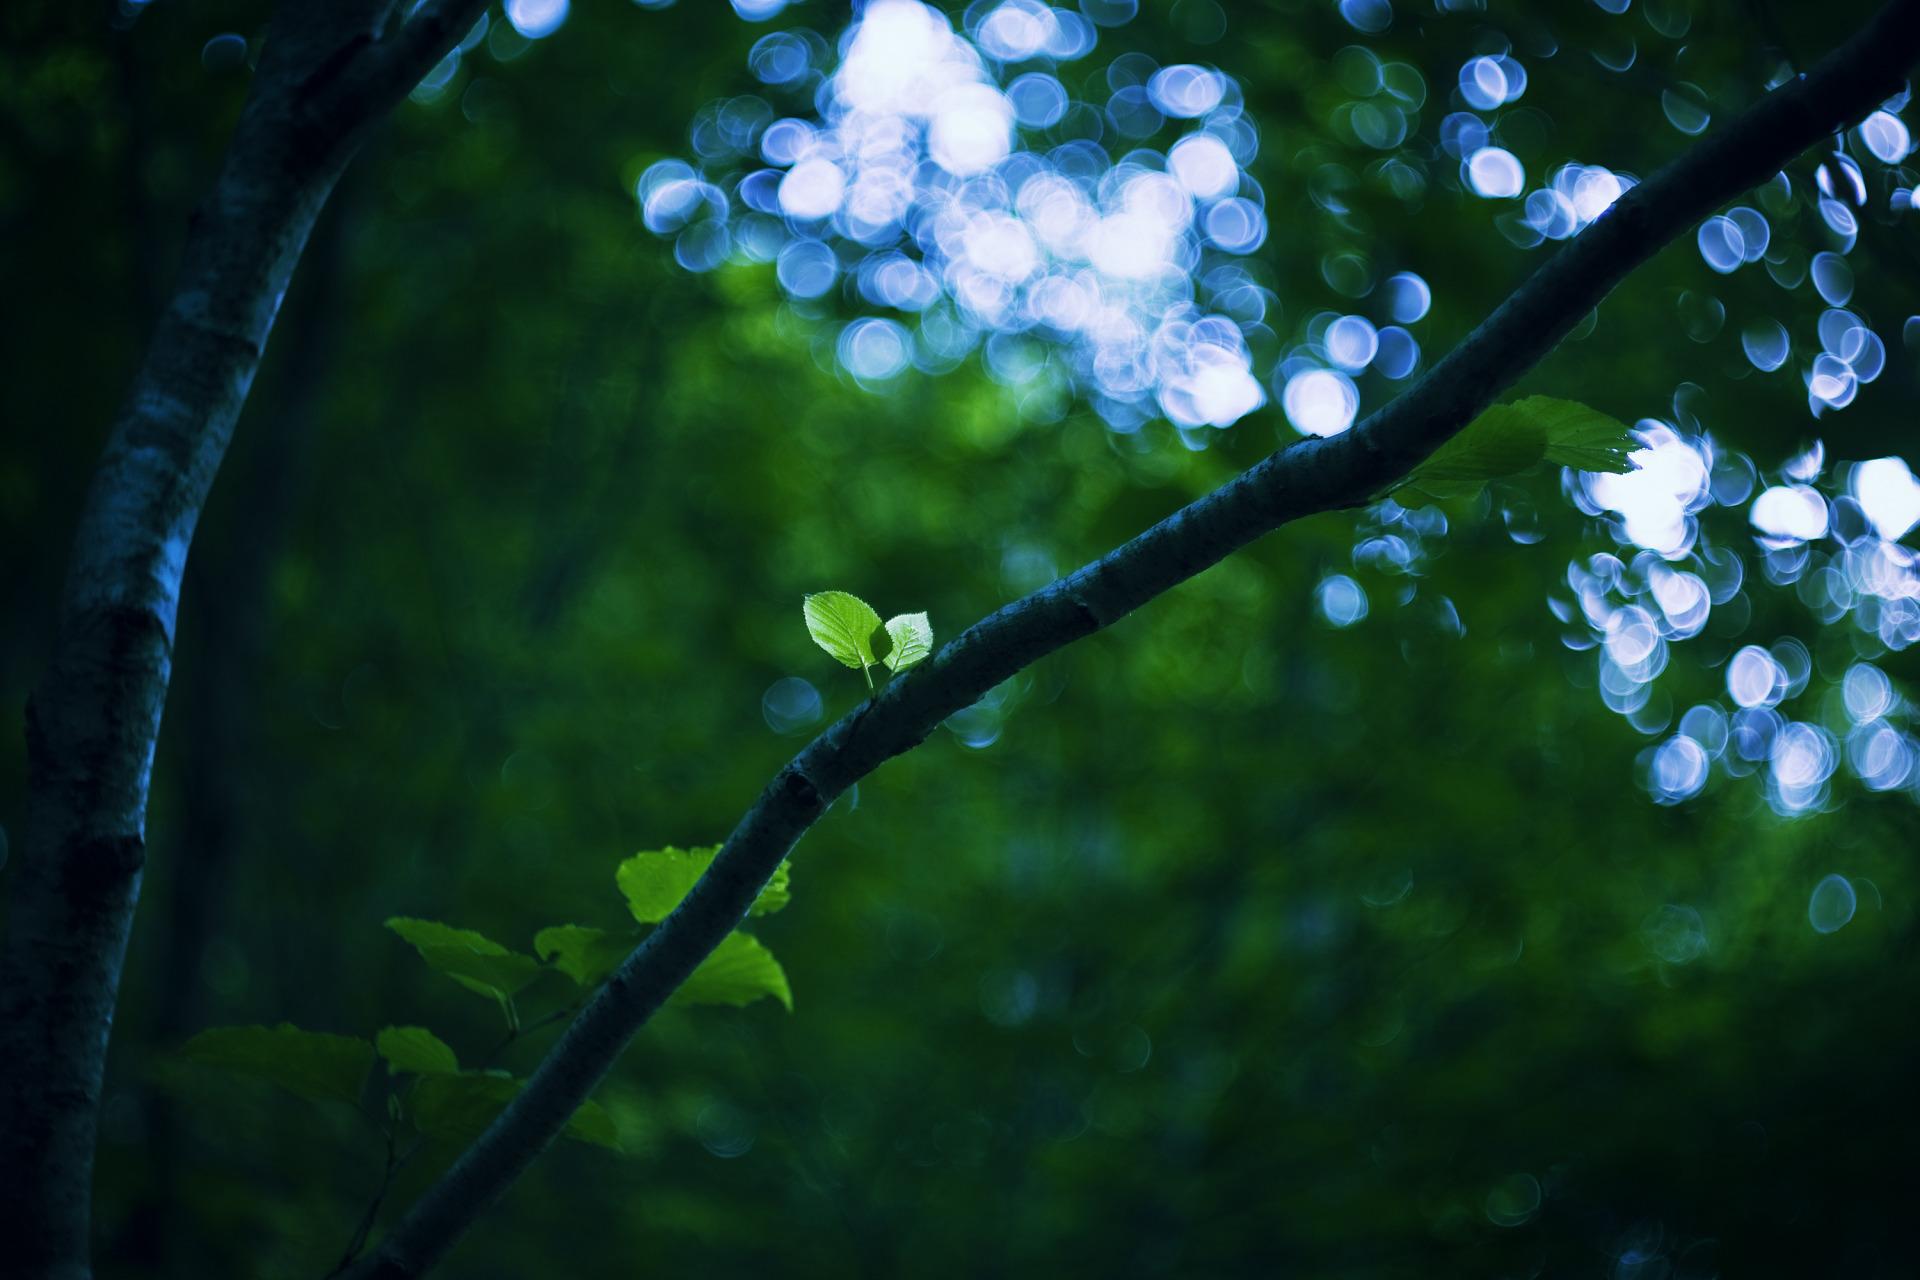 лес зелень ветви  № 2801065 бесплатно